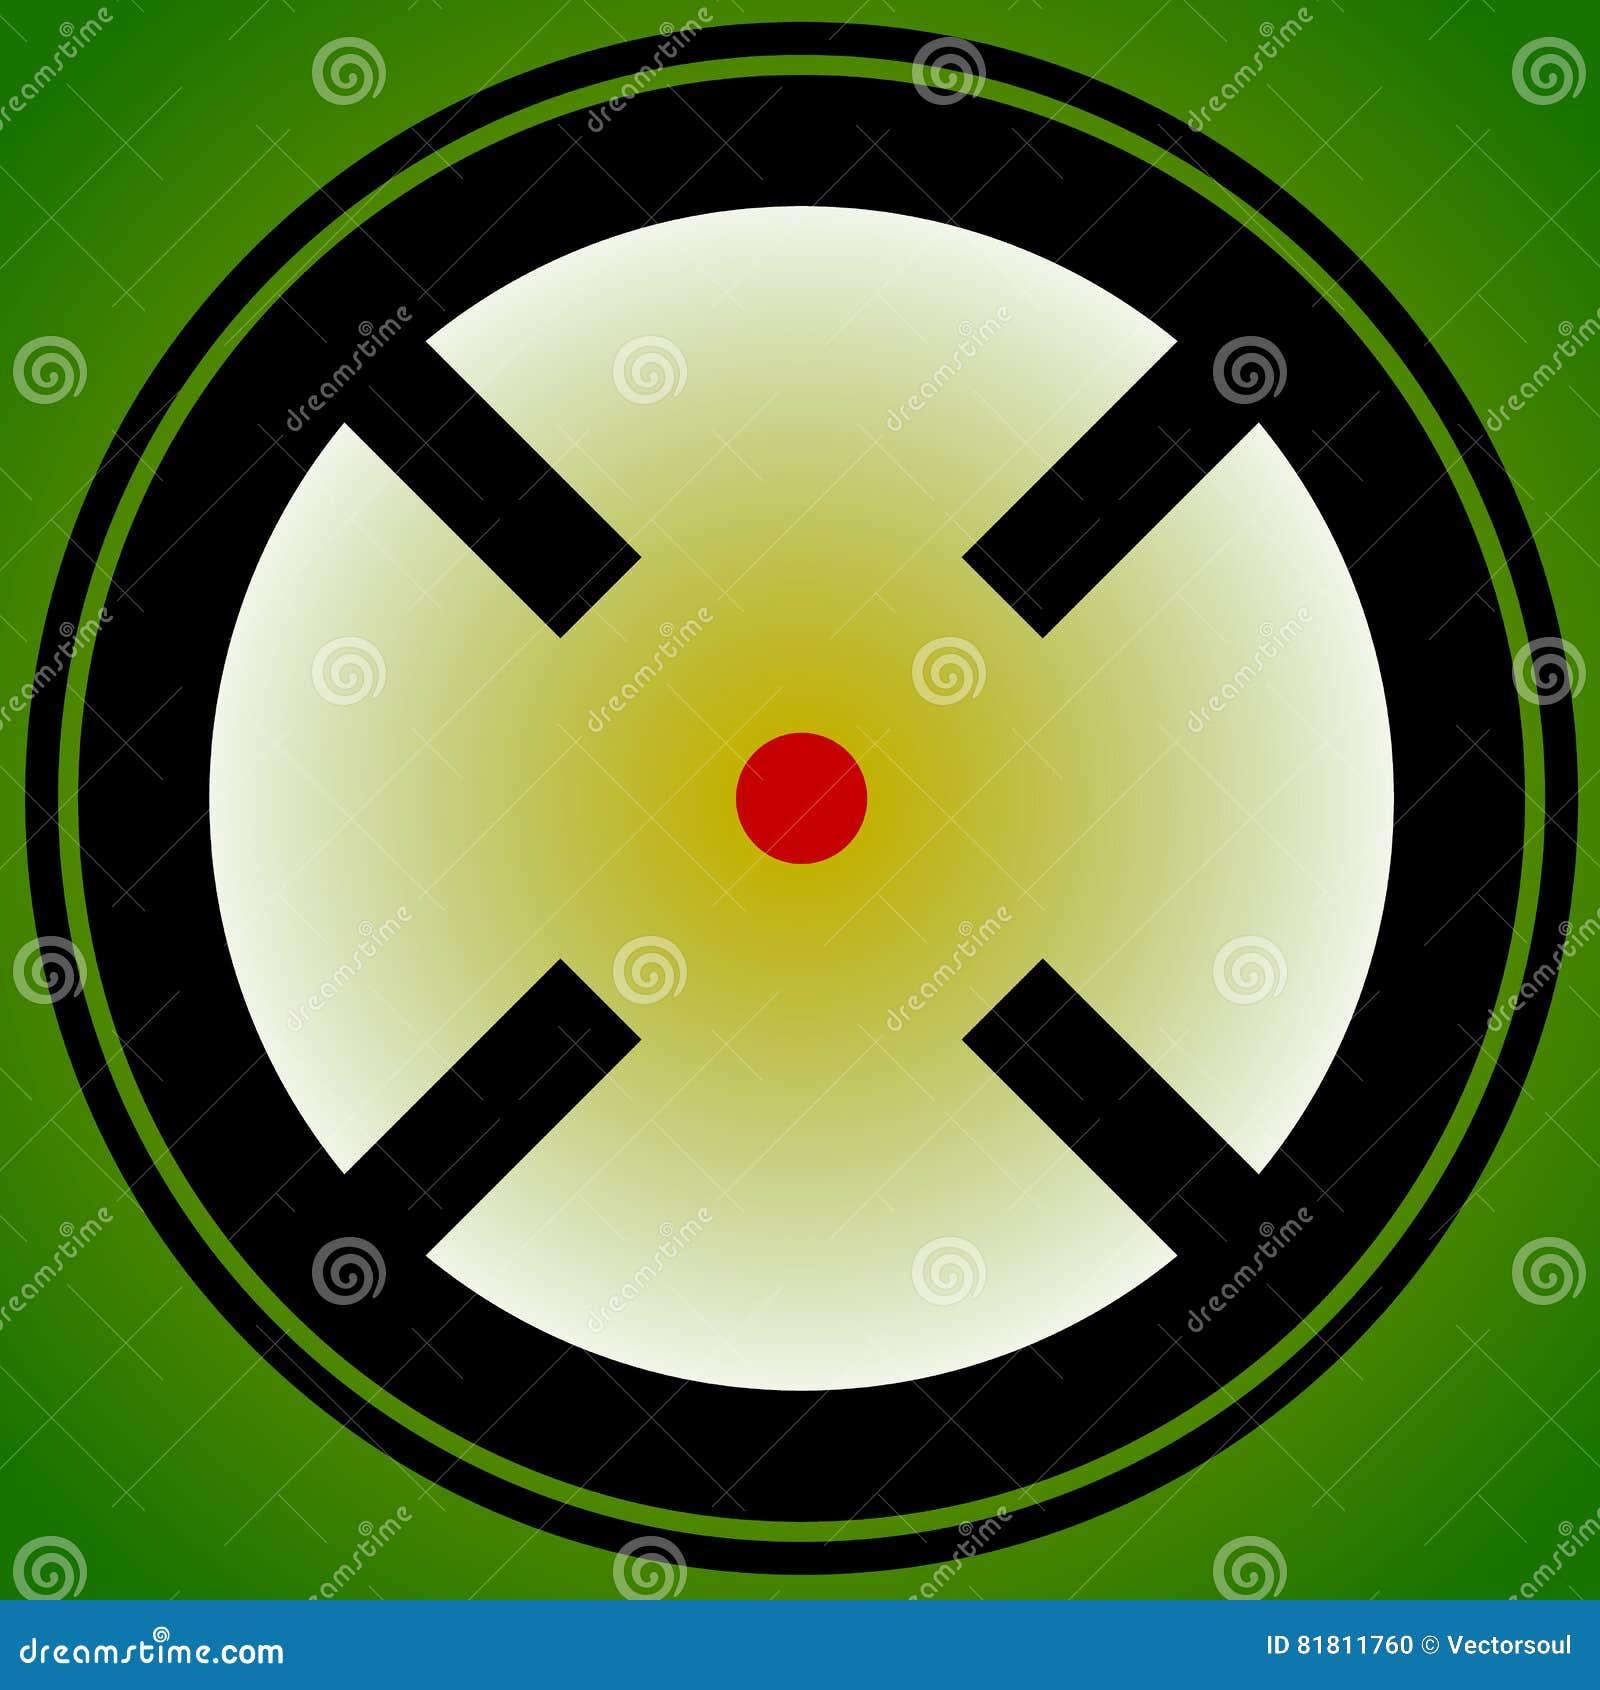 Doelteken, dradenkruis, crosshair pictogram voor nadruk, nauwkeurigheid, doel